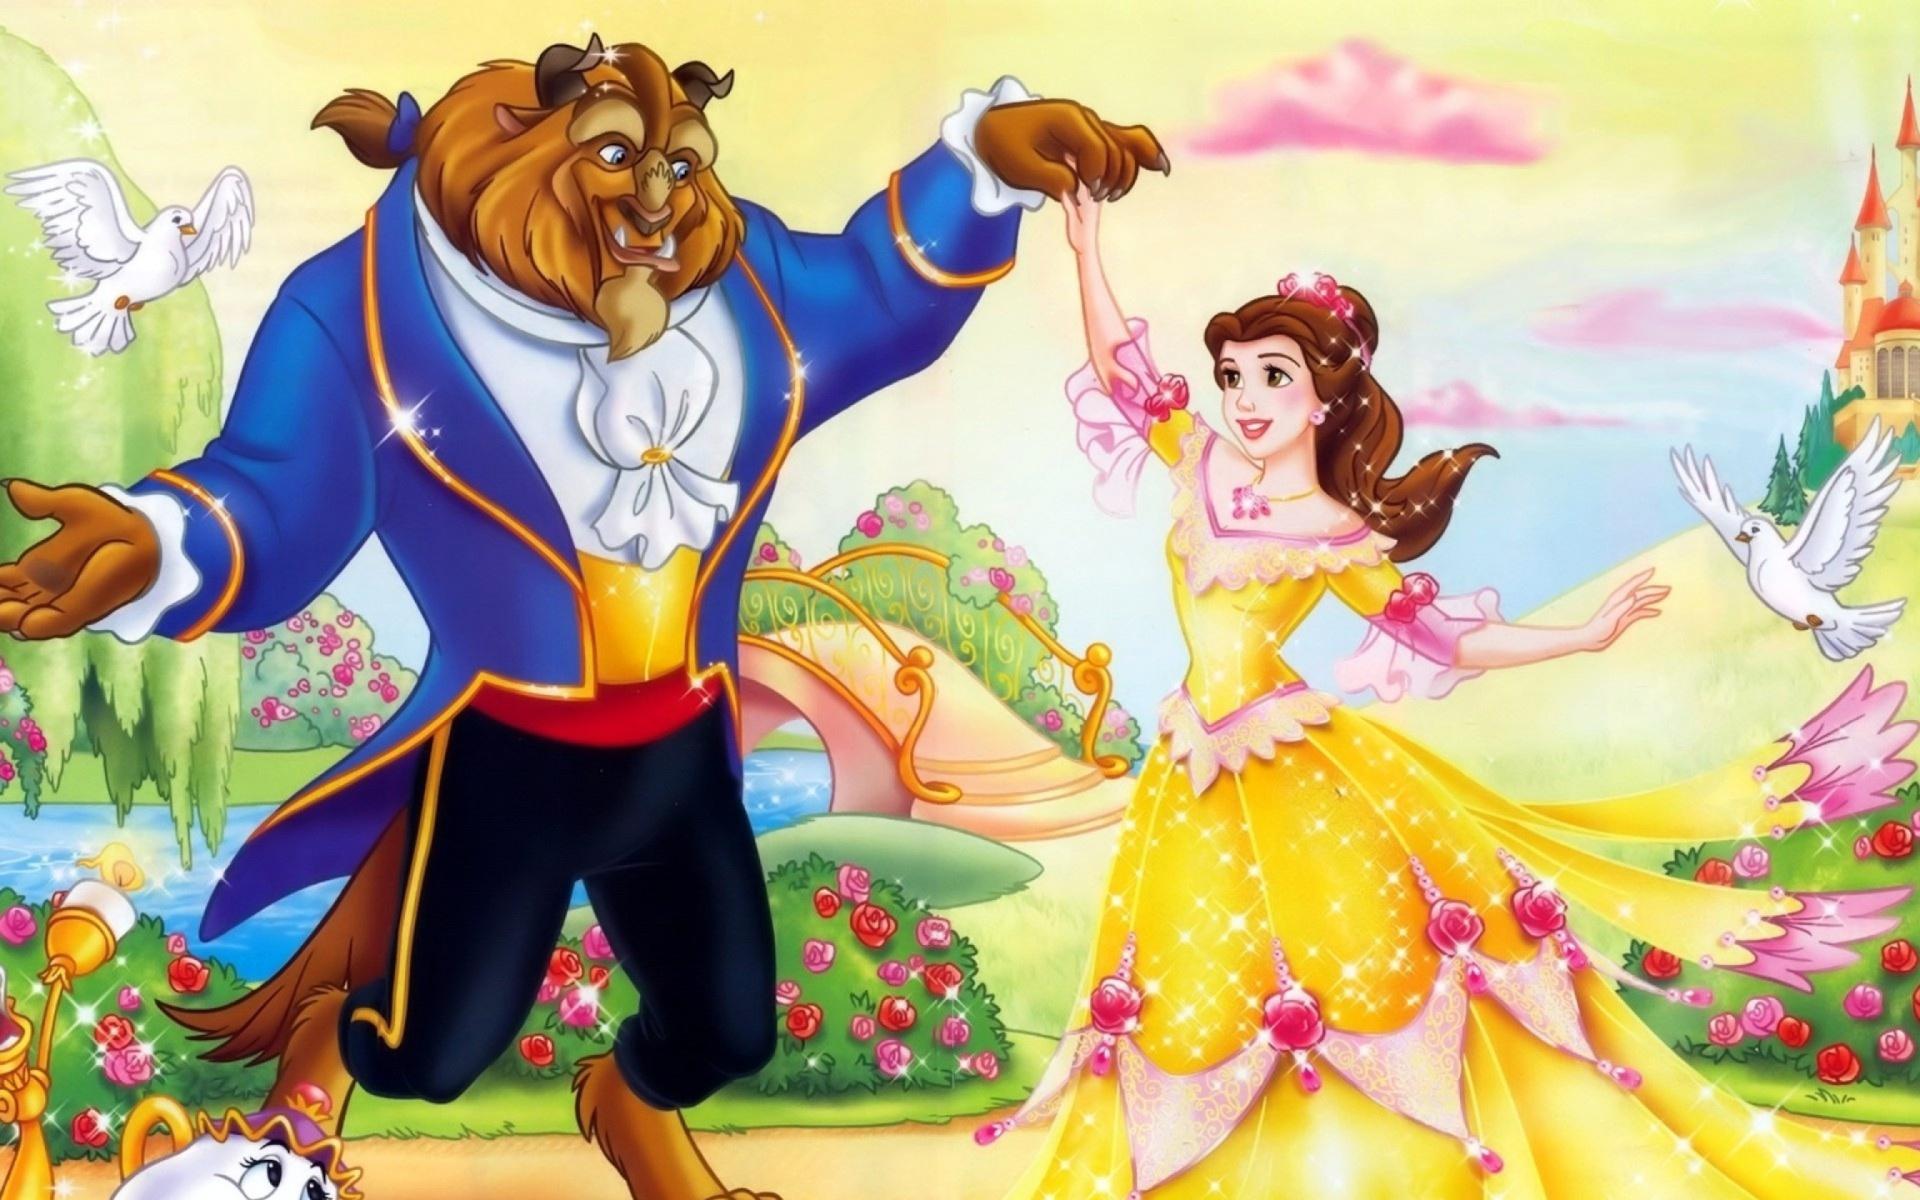 Beauty And The Beast Cartoon Wallpaper: Beauty And The Beast Disney Cartoon Wallpaper For